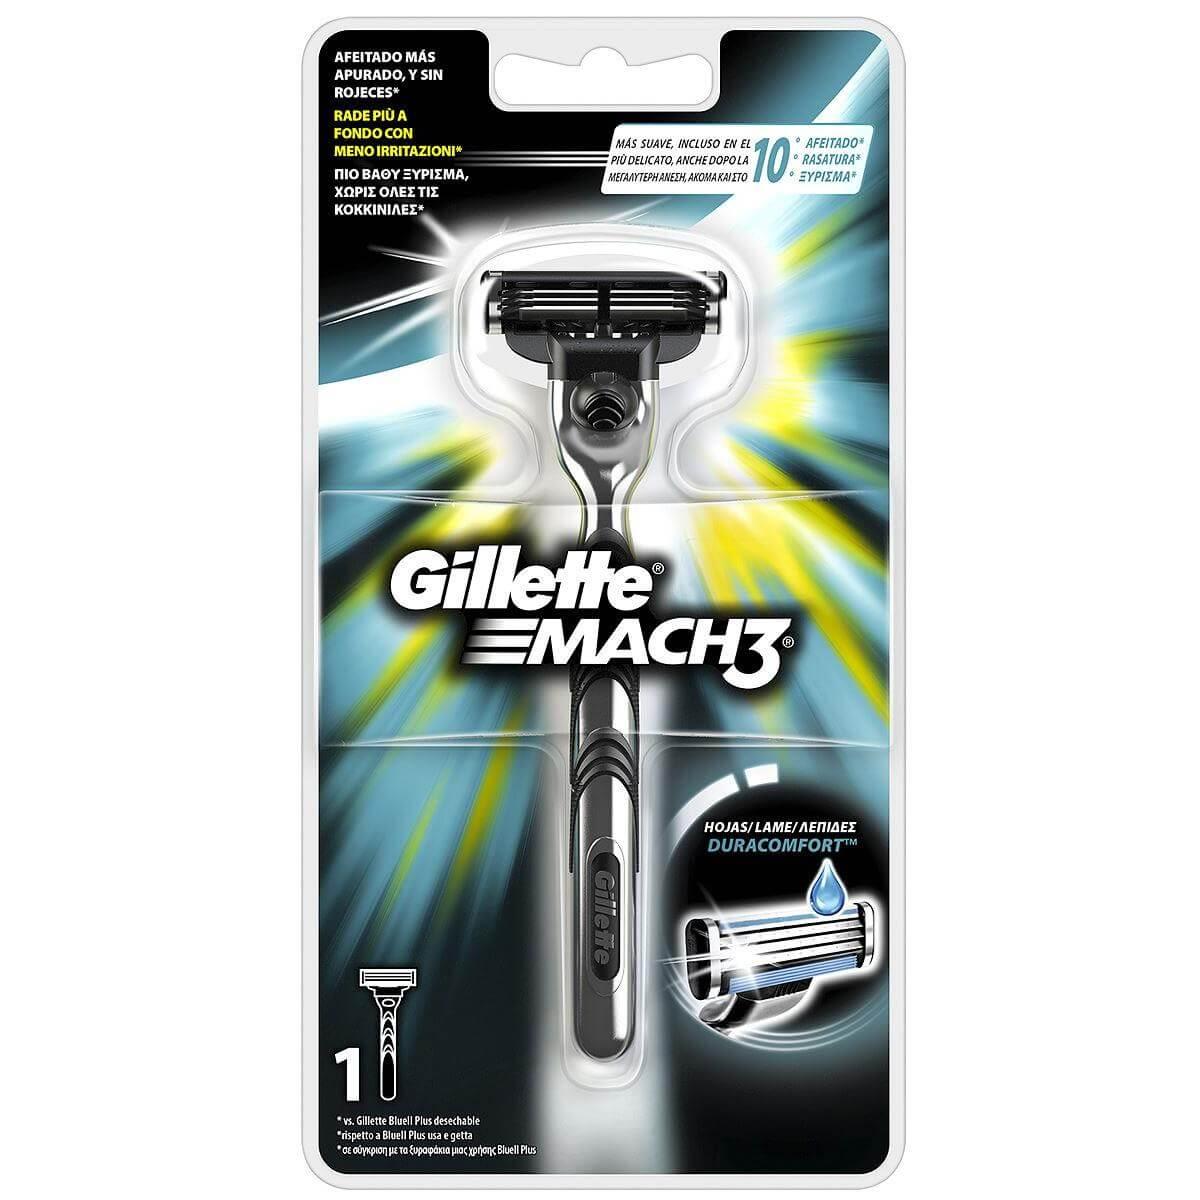 Gillette Mach 3 Ξυριστική Μηχανή με 3 Λεπτές Λεπίδες & Λιπαντική Ταινία Για πιο Βαθύ Ξύρισμα έως 100% Χωρίς Κοκκινίλες 1Τεμάχιο